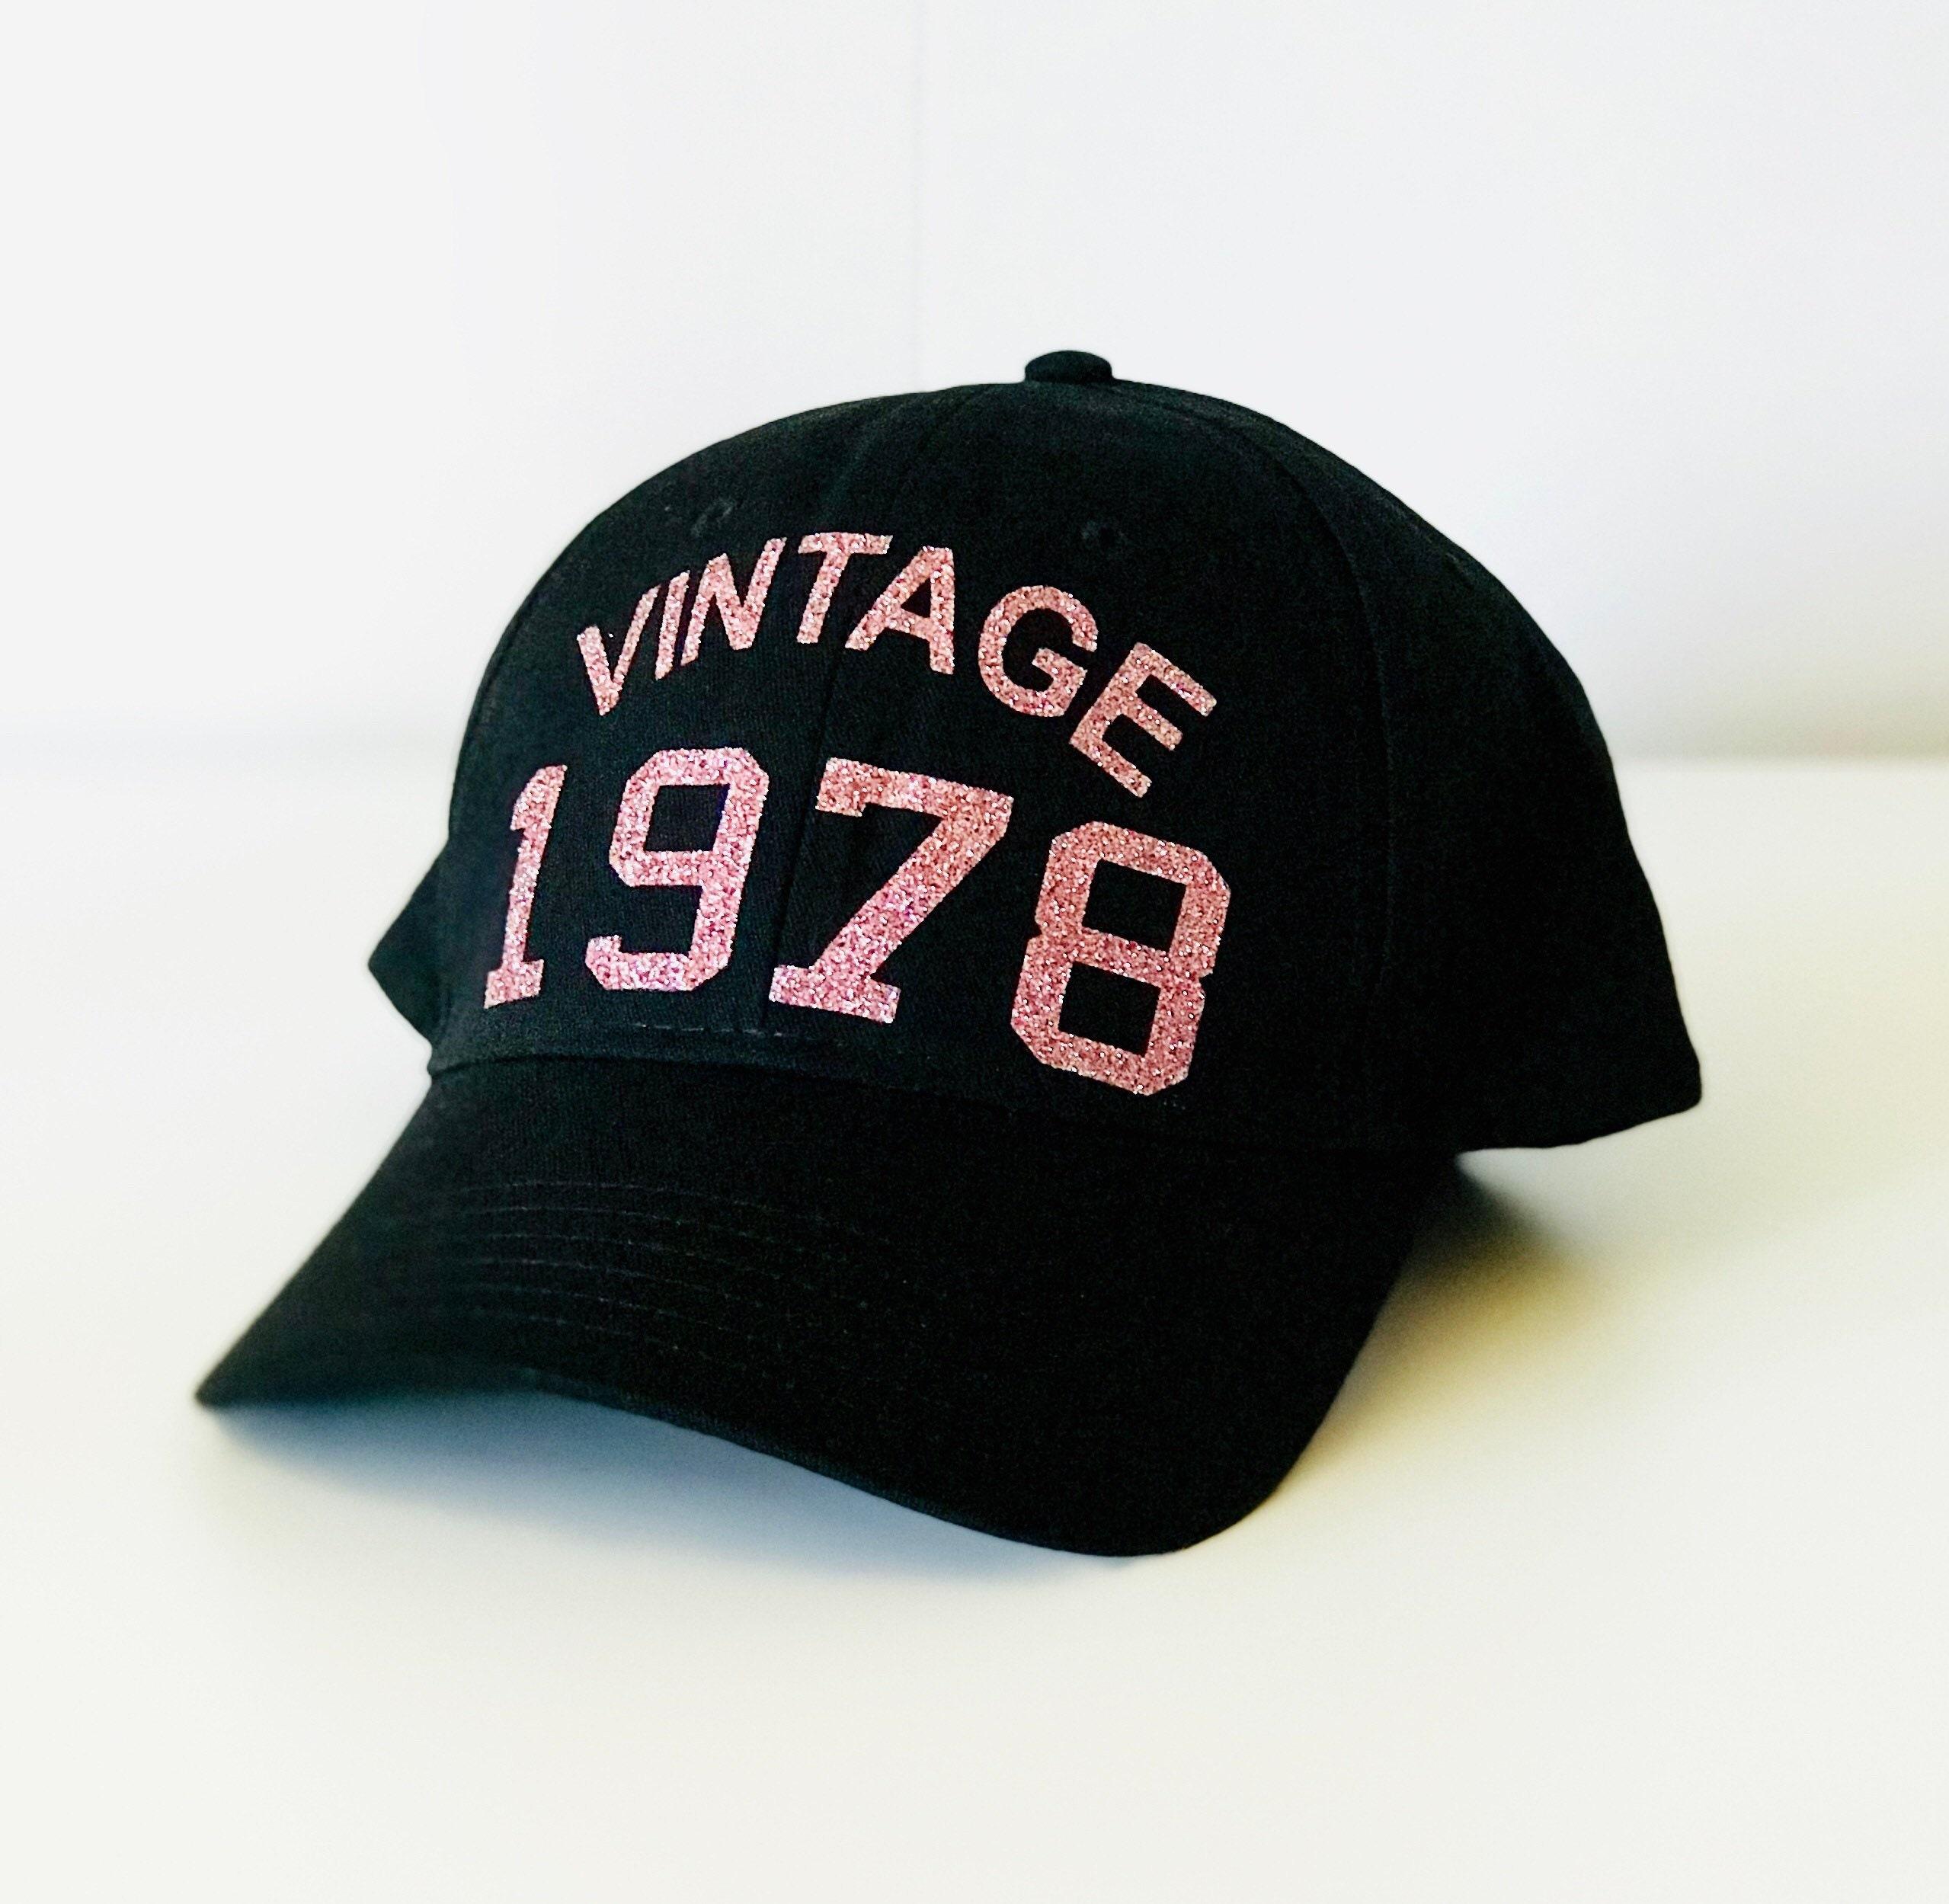 Vintage 1978 Hat 40th Birthday